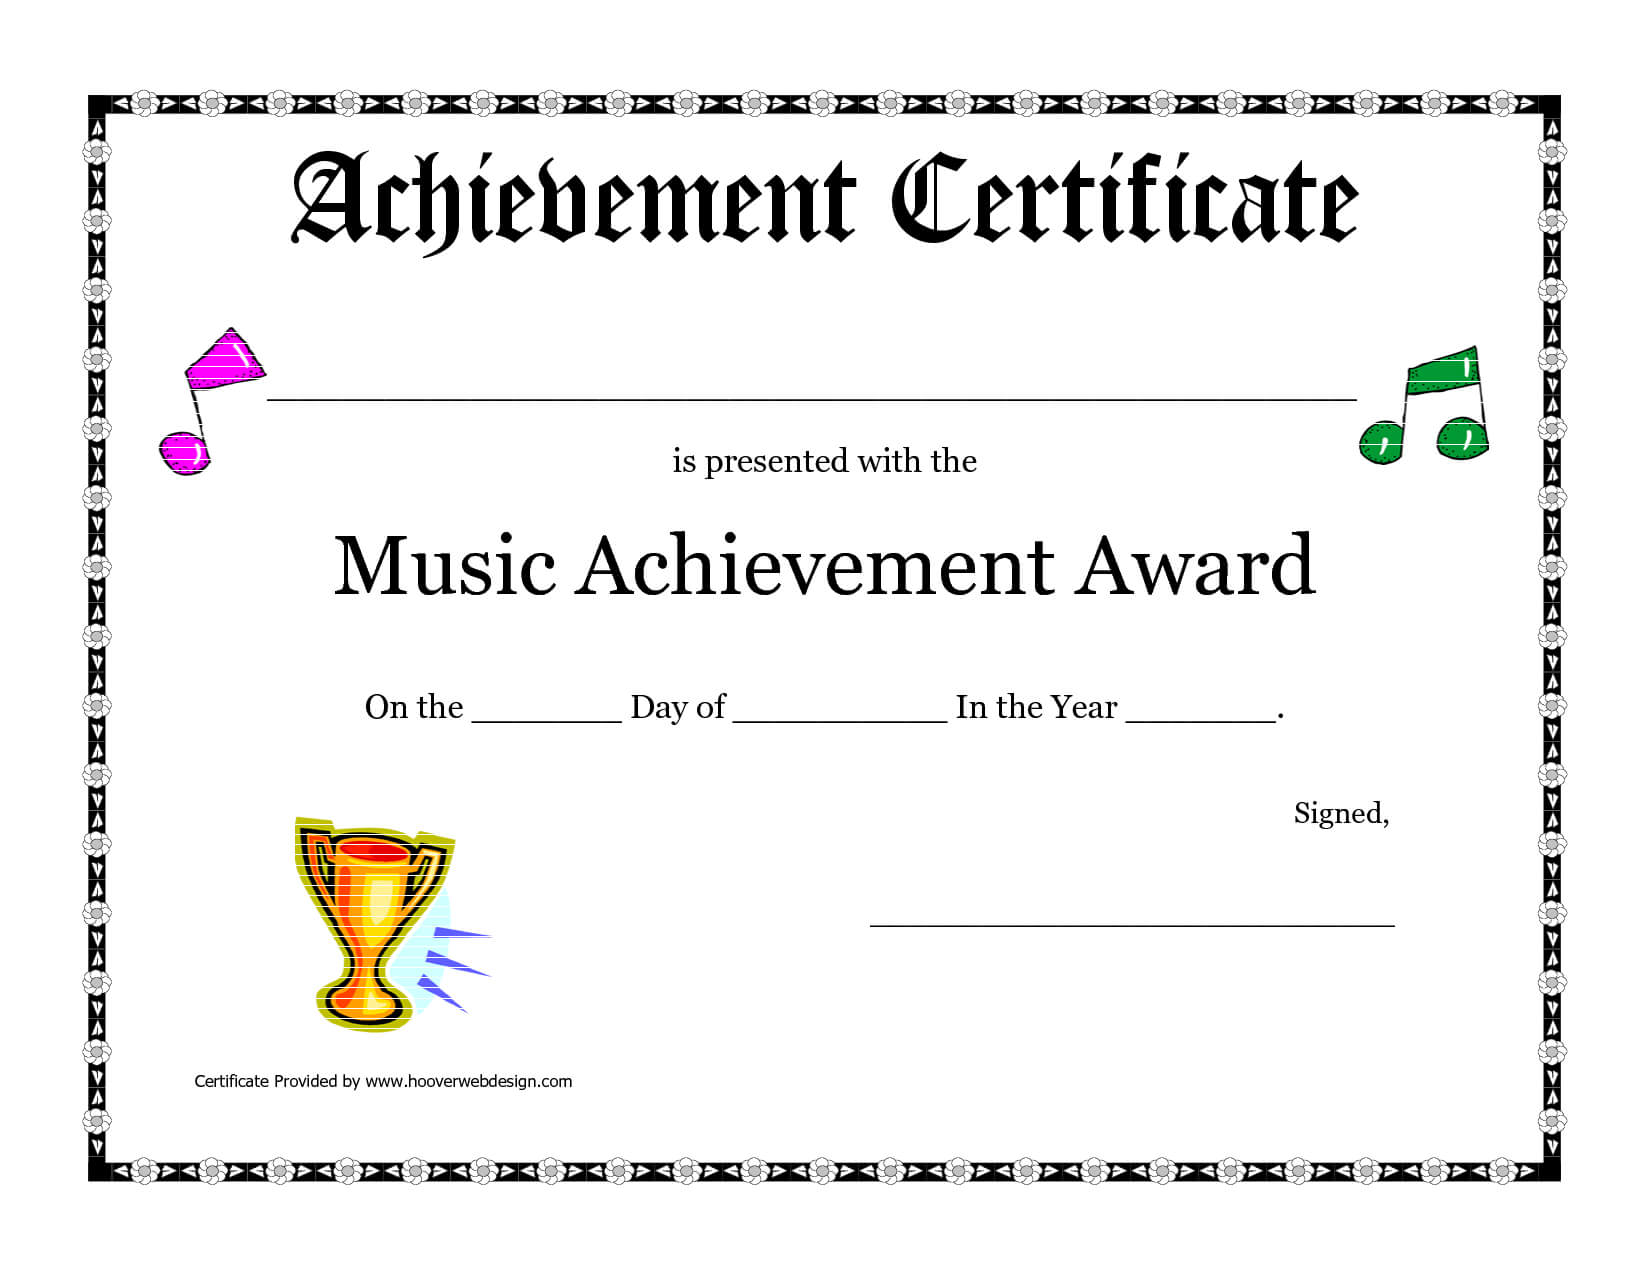 Free Printable Achievement Award Certificate Template Throughout Hayes Certificate Templates